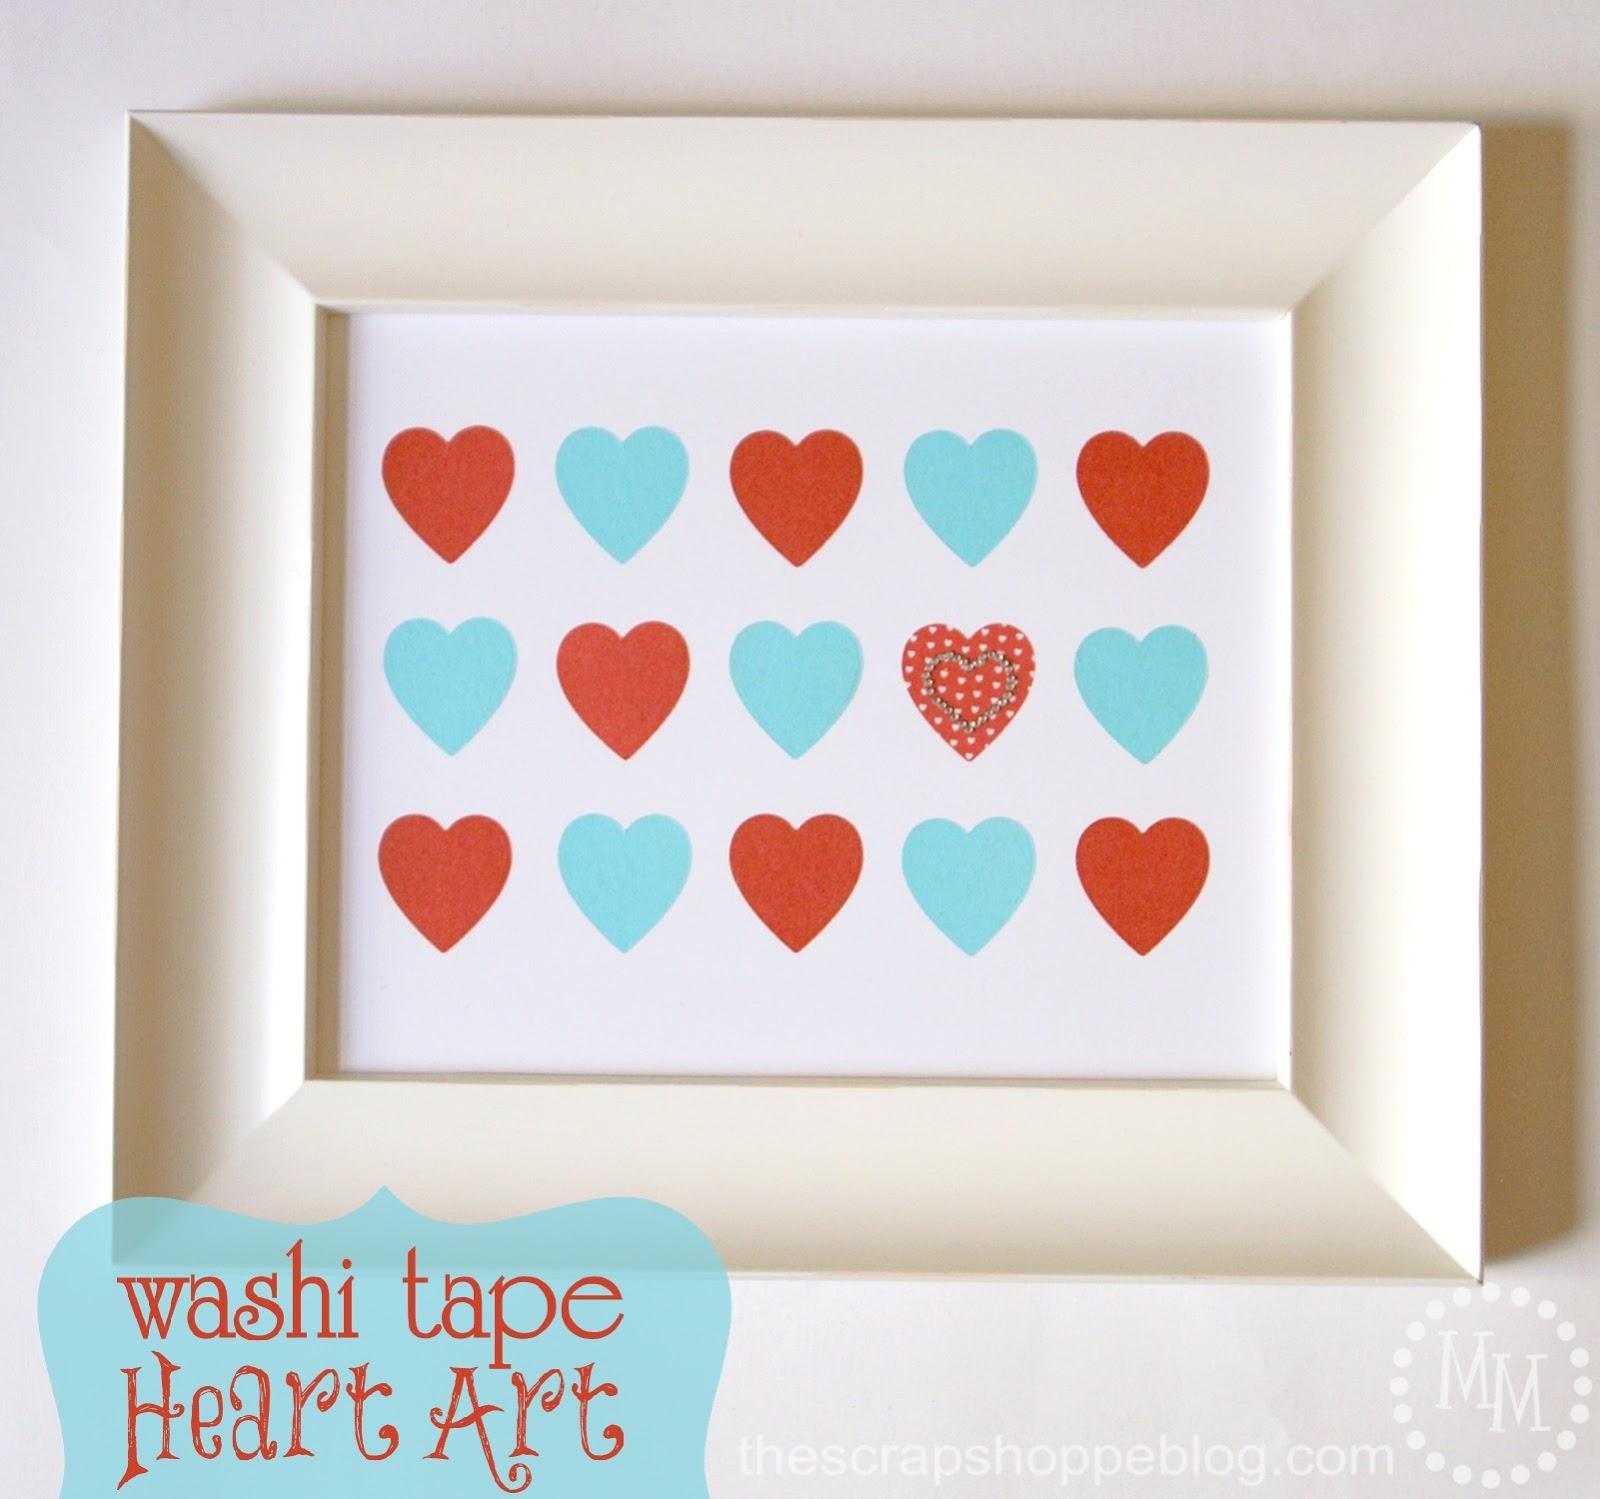 valentine 39 s day washi tape heart art lifestyle crafts. Black Bedroom Furniture Sets. Home Design Ideas